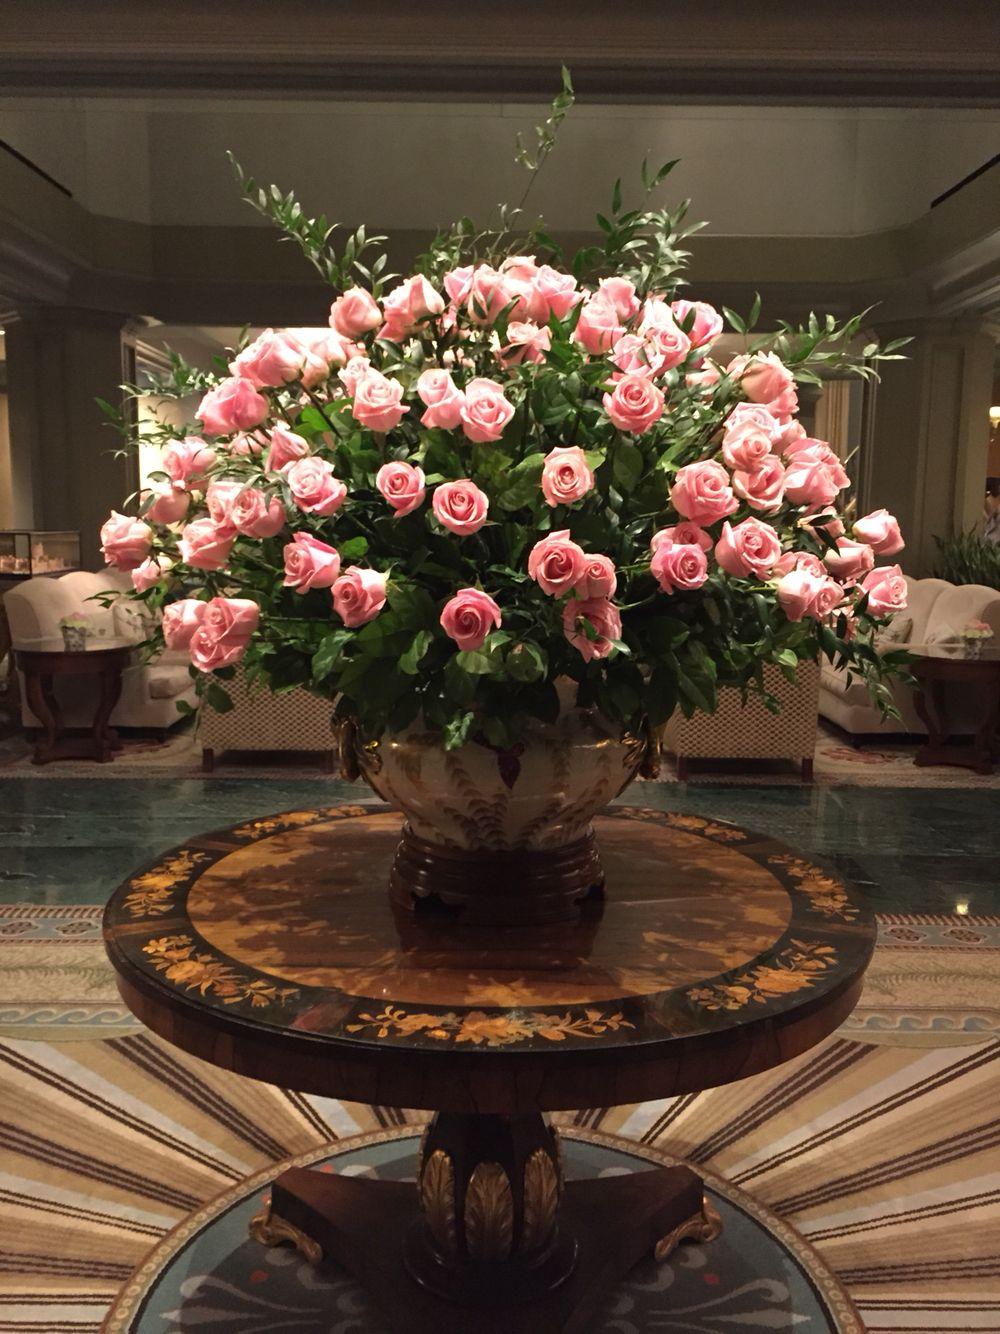 Windsor court hotel new orleans pink roses flower power windsor court hotel new orleans pink roses large floral arrangements ikebana flower arrangement izmirmasajfo